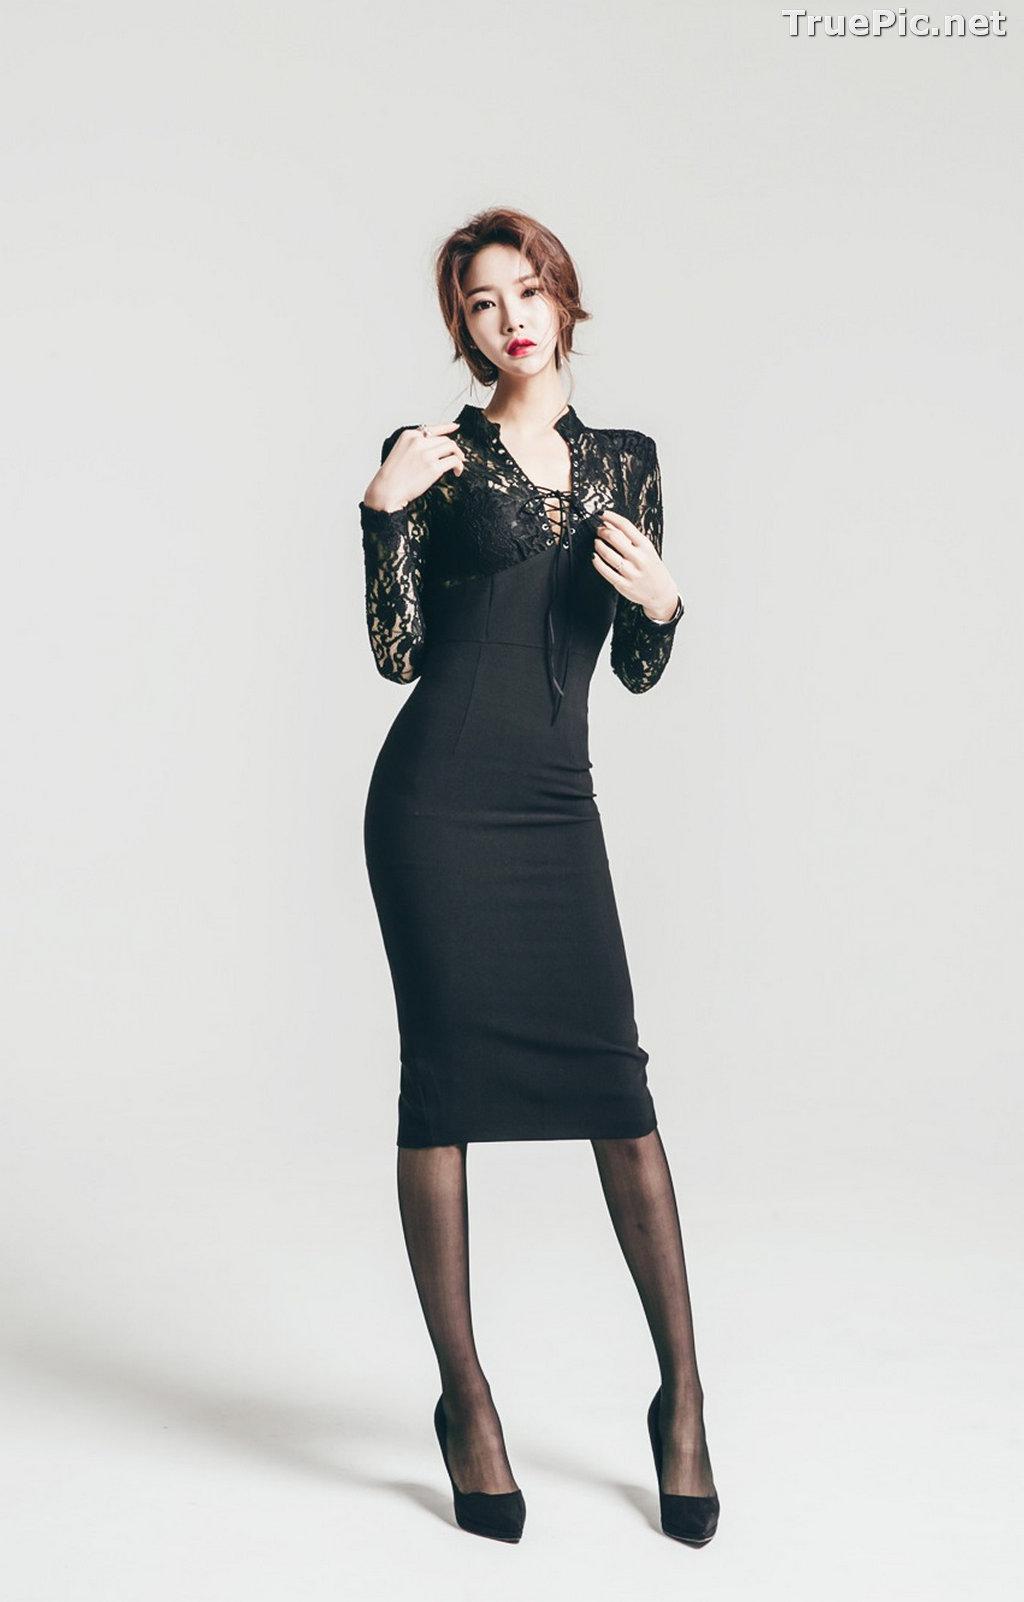 Image Korean Beautiful Model – Park Jung Yoon – Fashion Photography #11 - TruePic.net - Picture-66